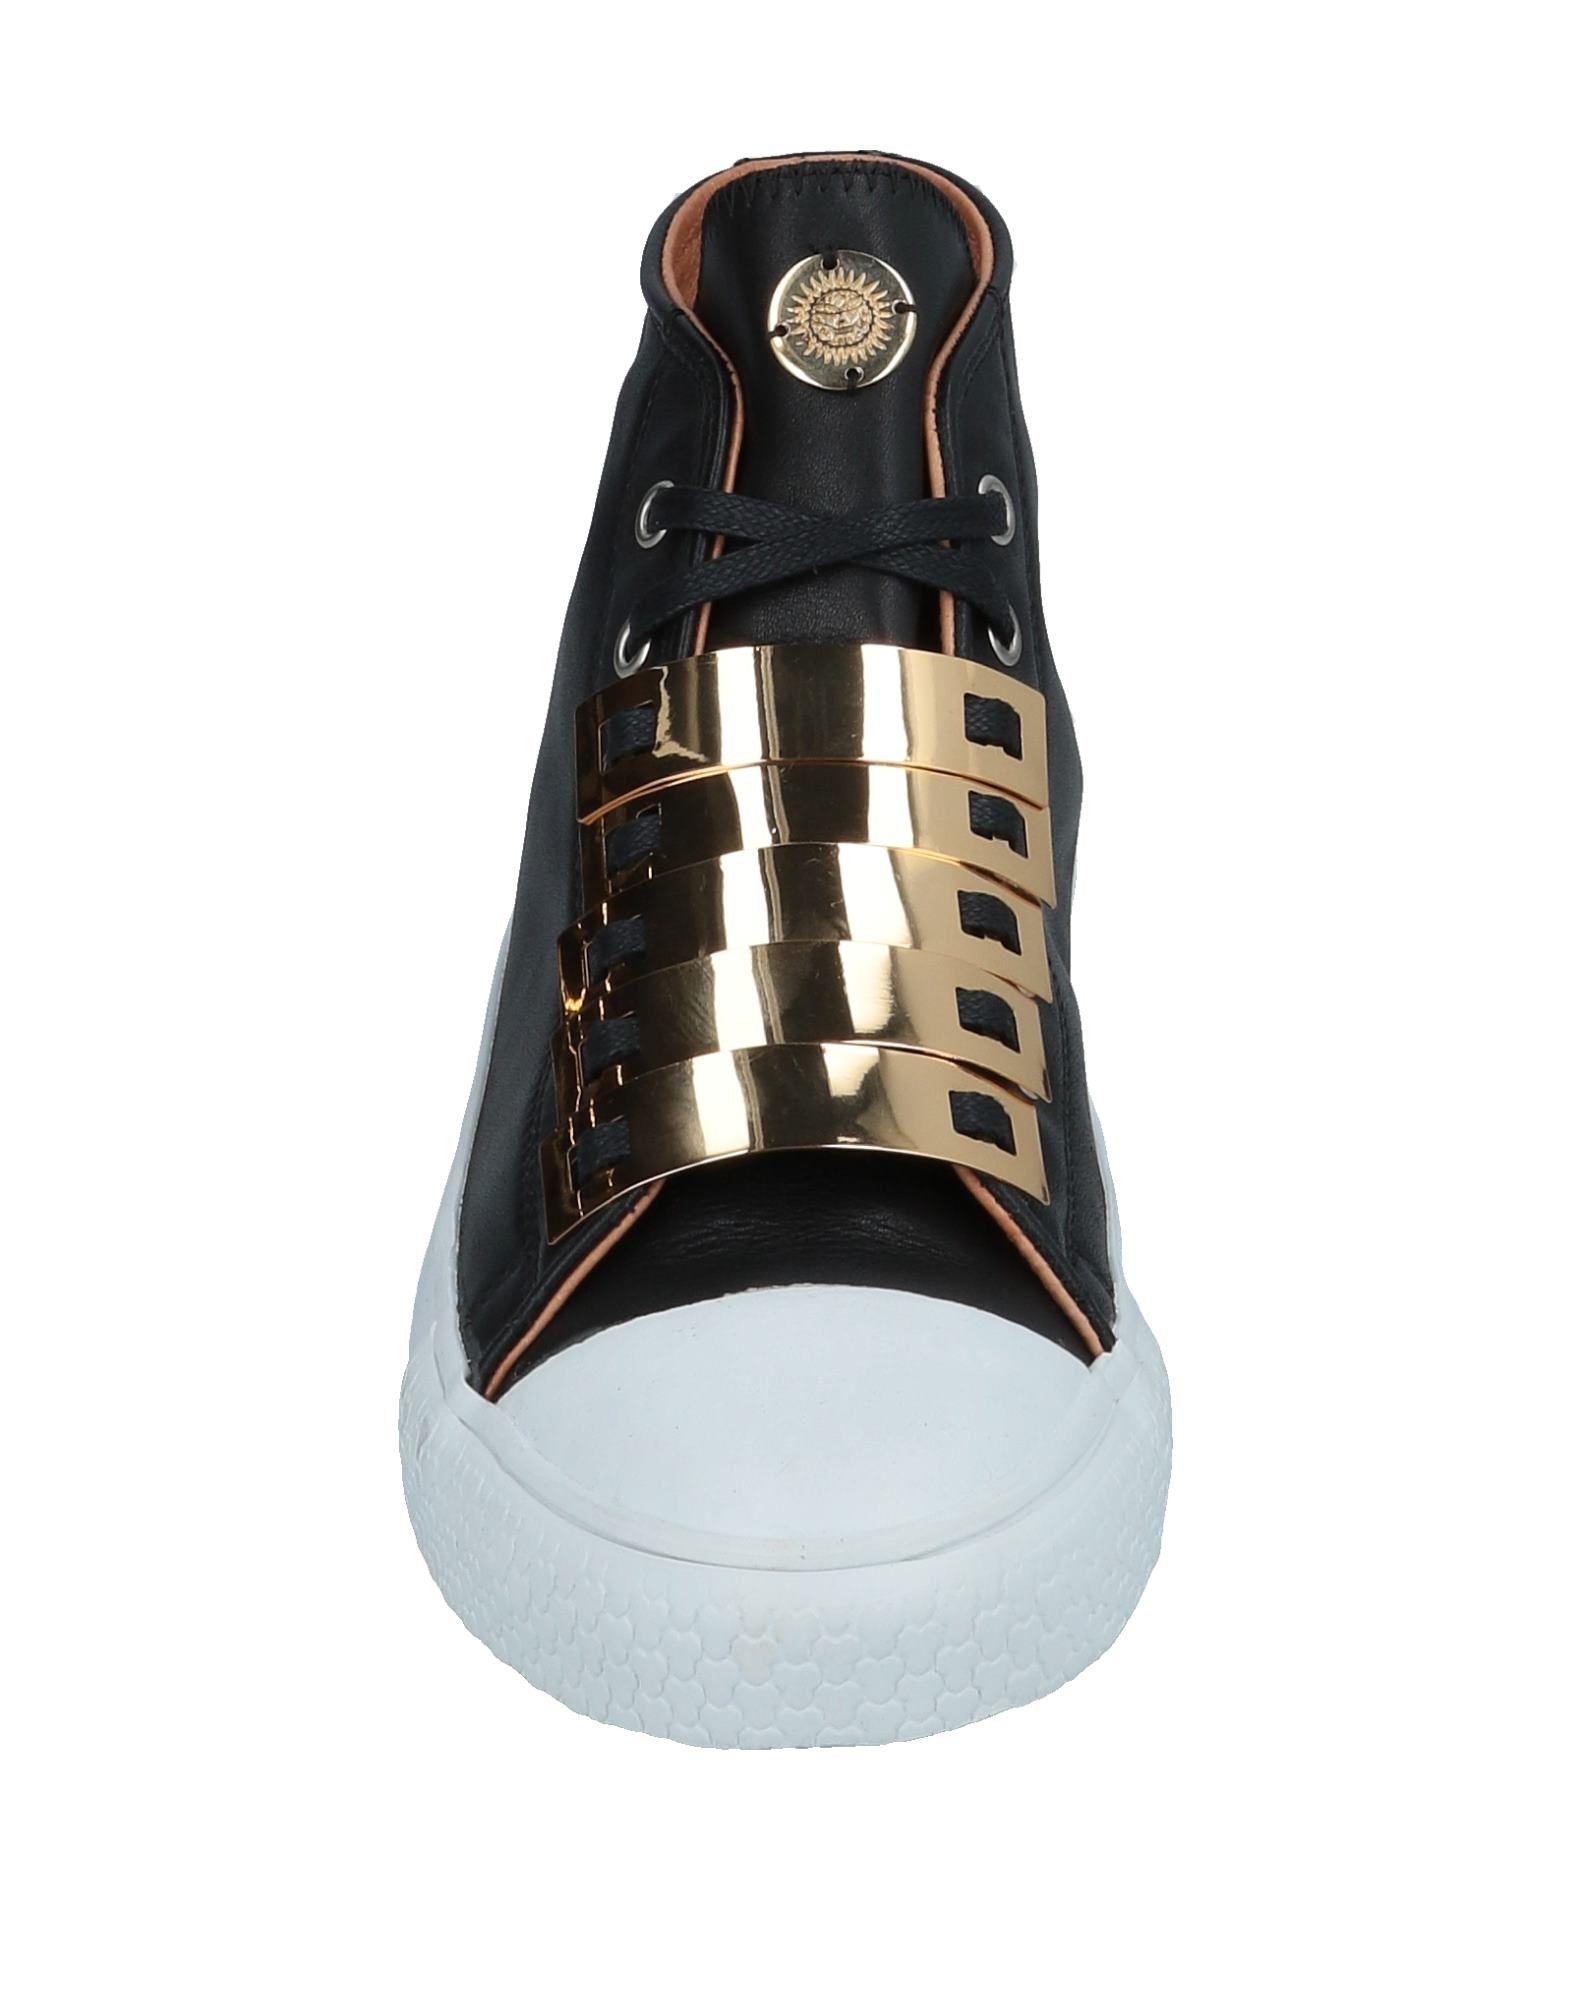 Black Dioniso Sneakers strapazierfähige Damen  11559288AHGut aussehende strapazierfähige Sneakers Schuhe 7cdb2b